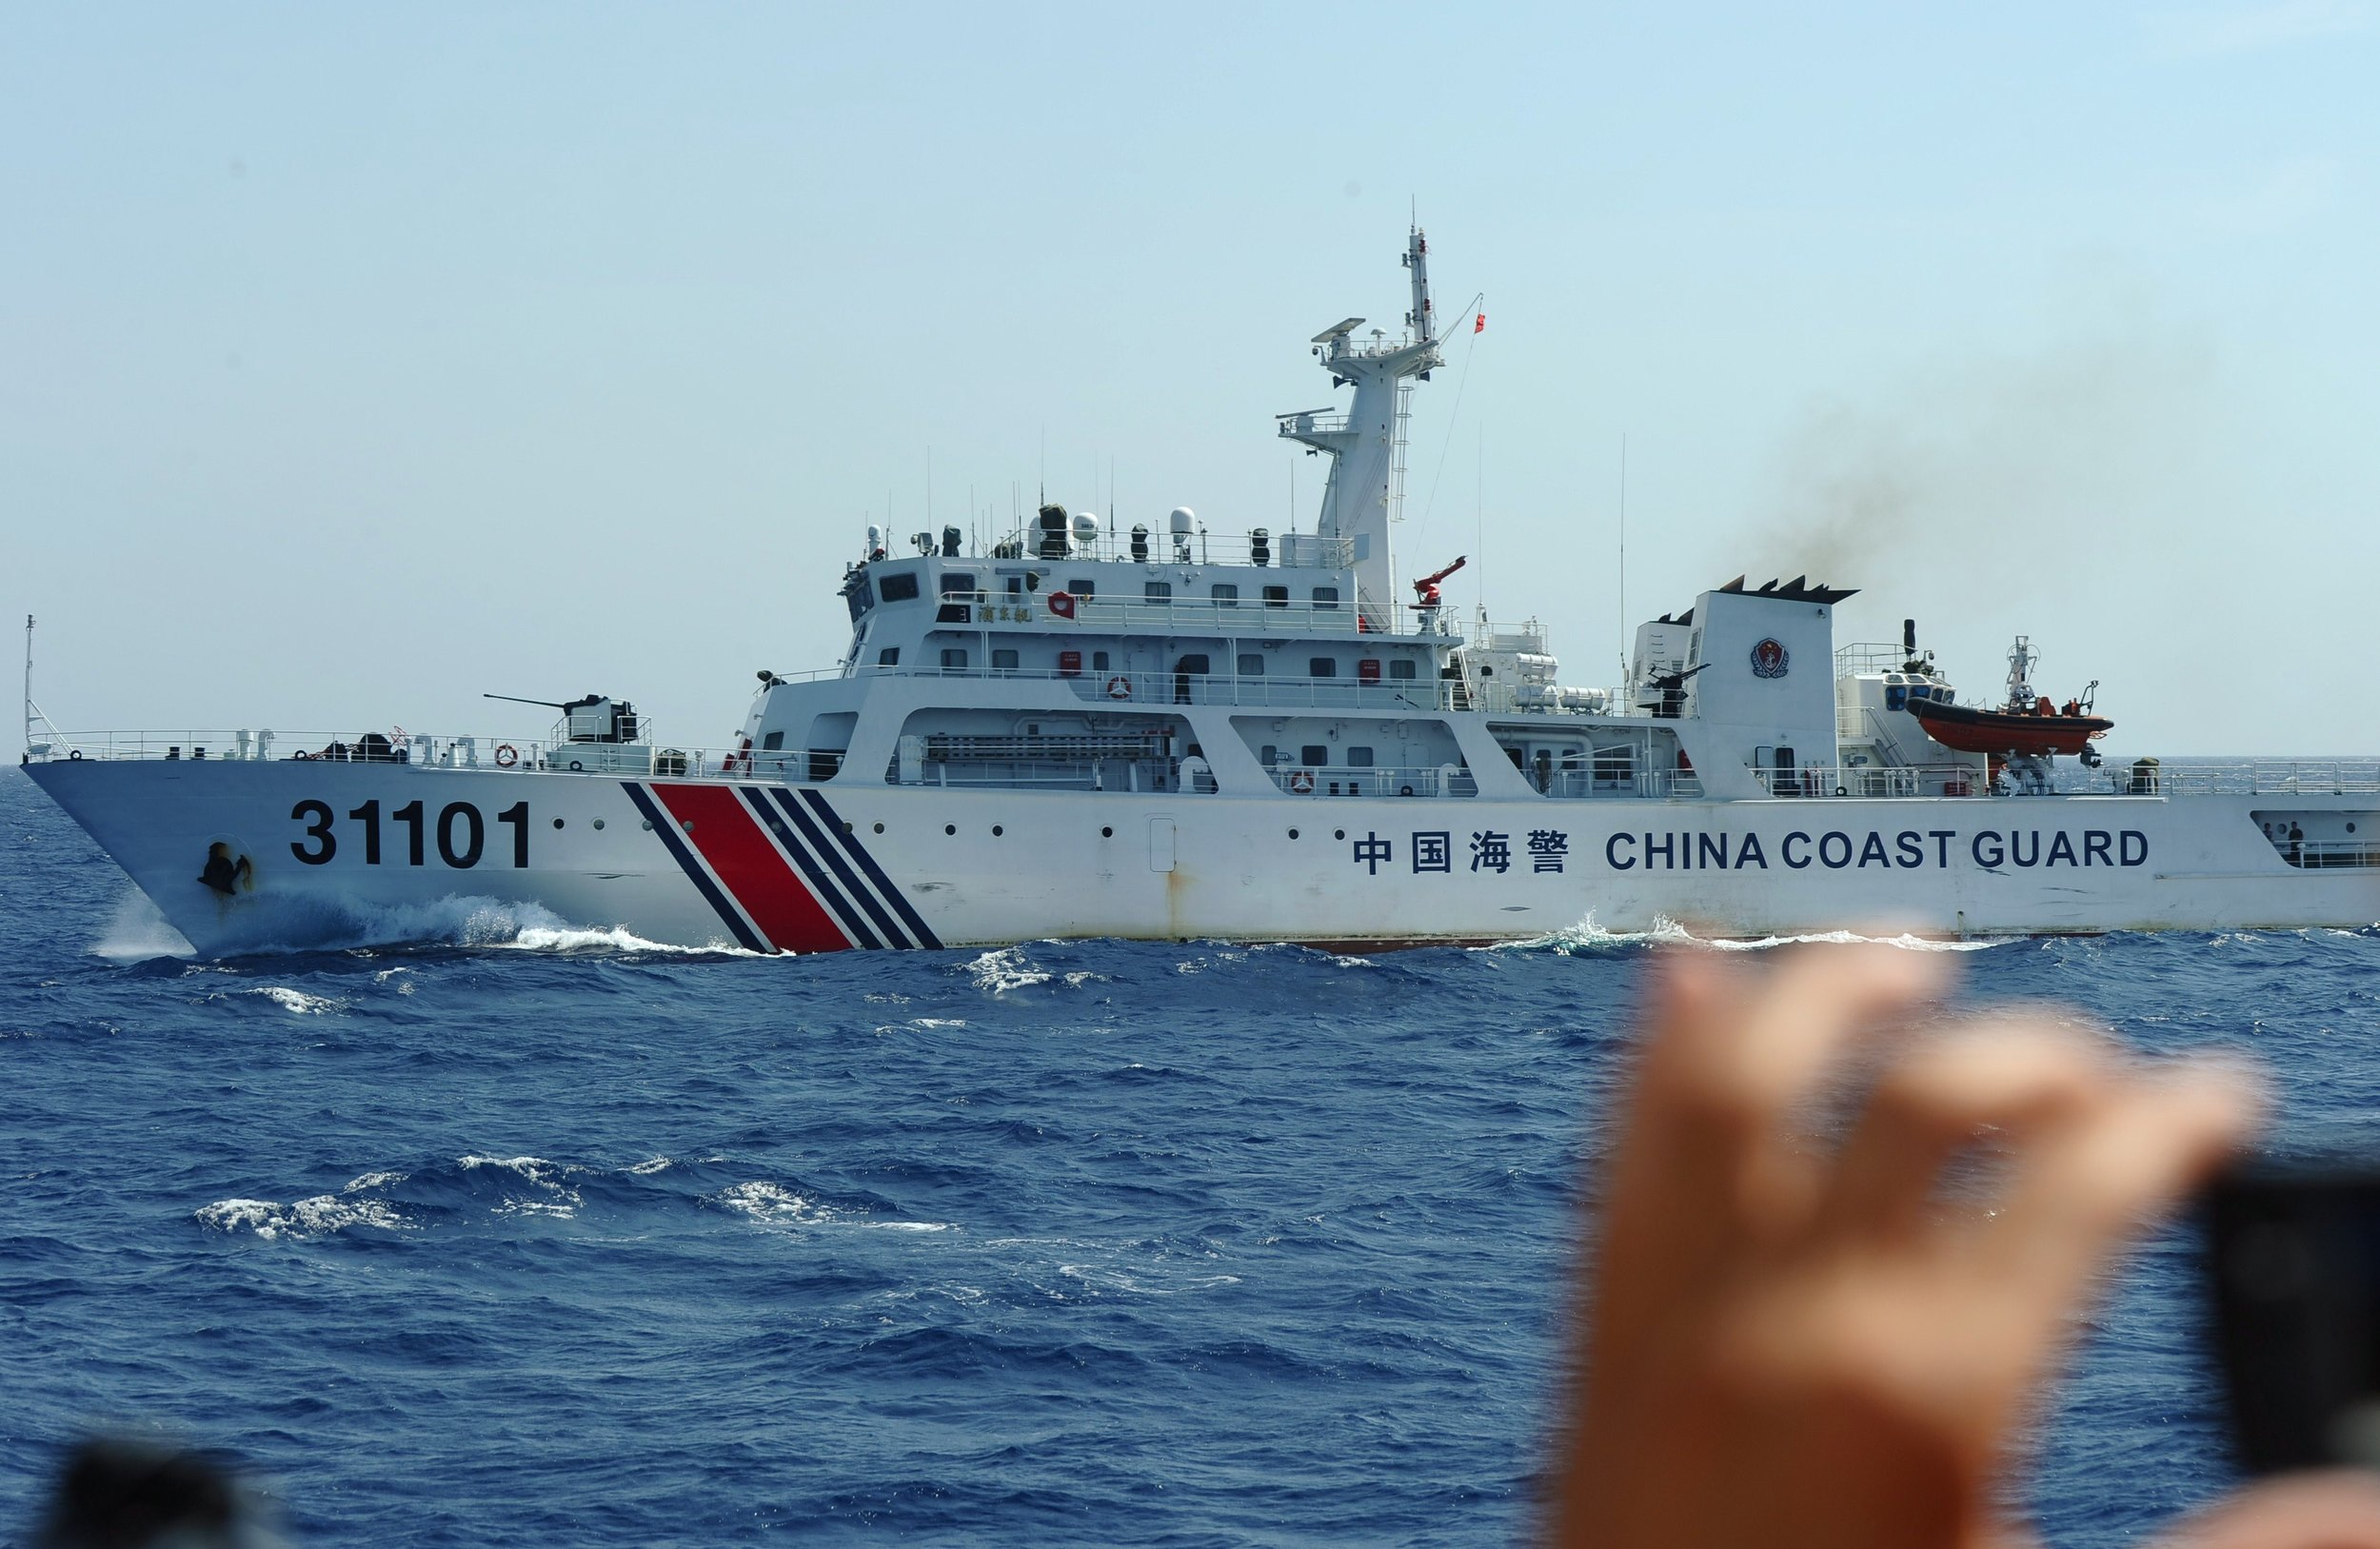 Chinese Coast Guard Ship